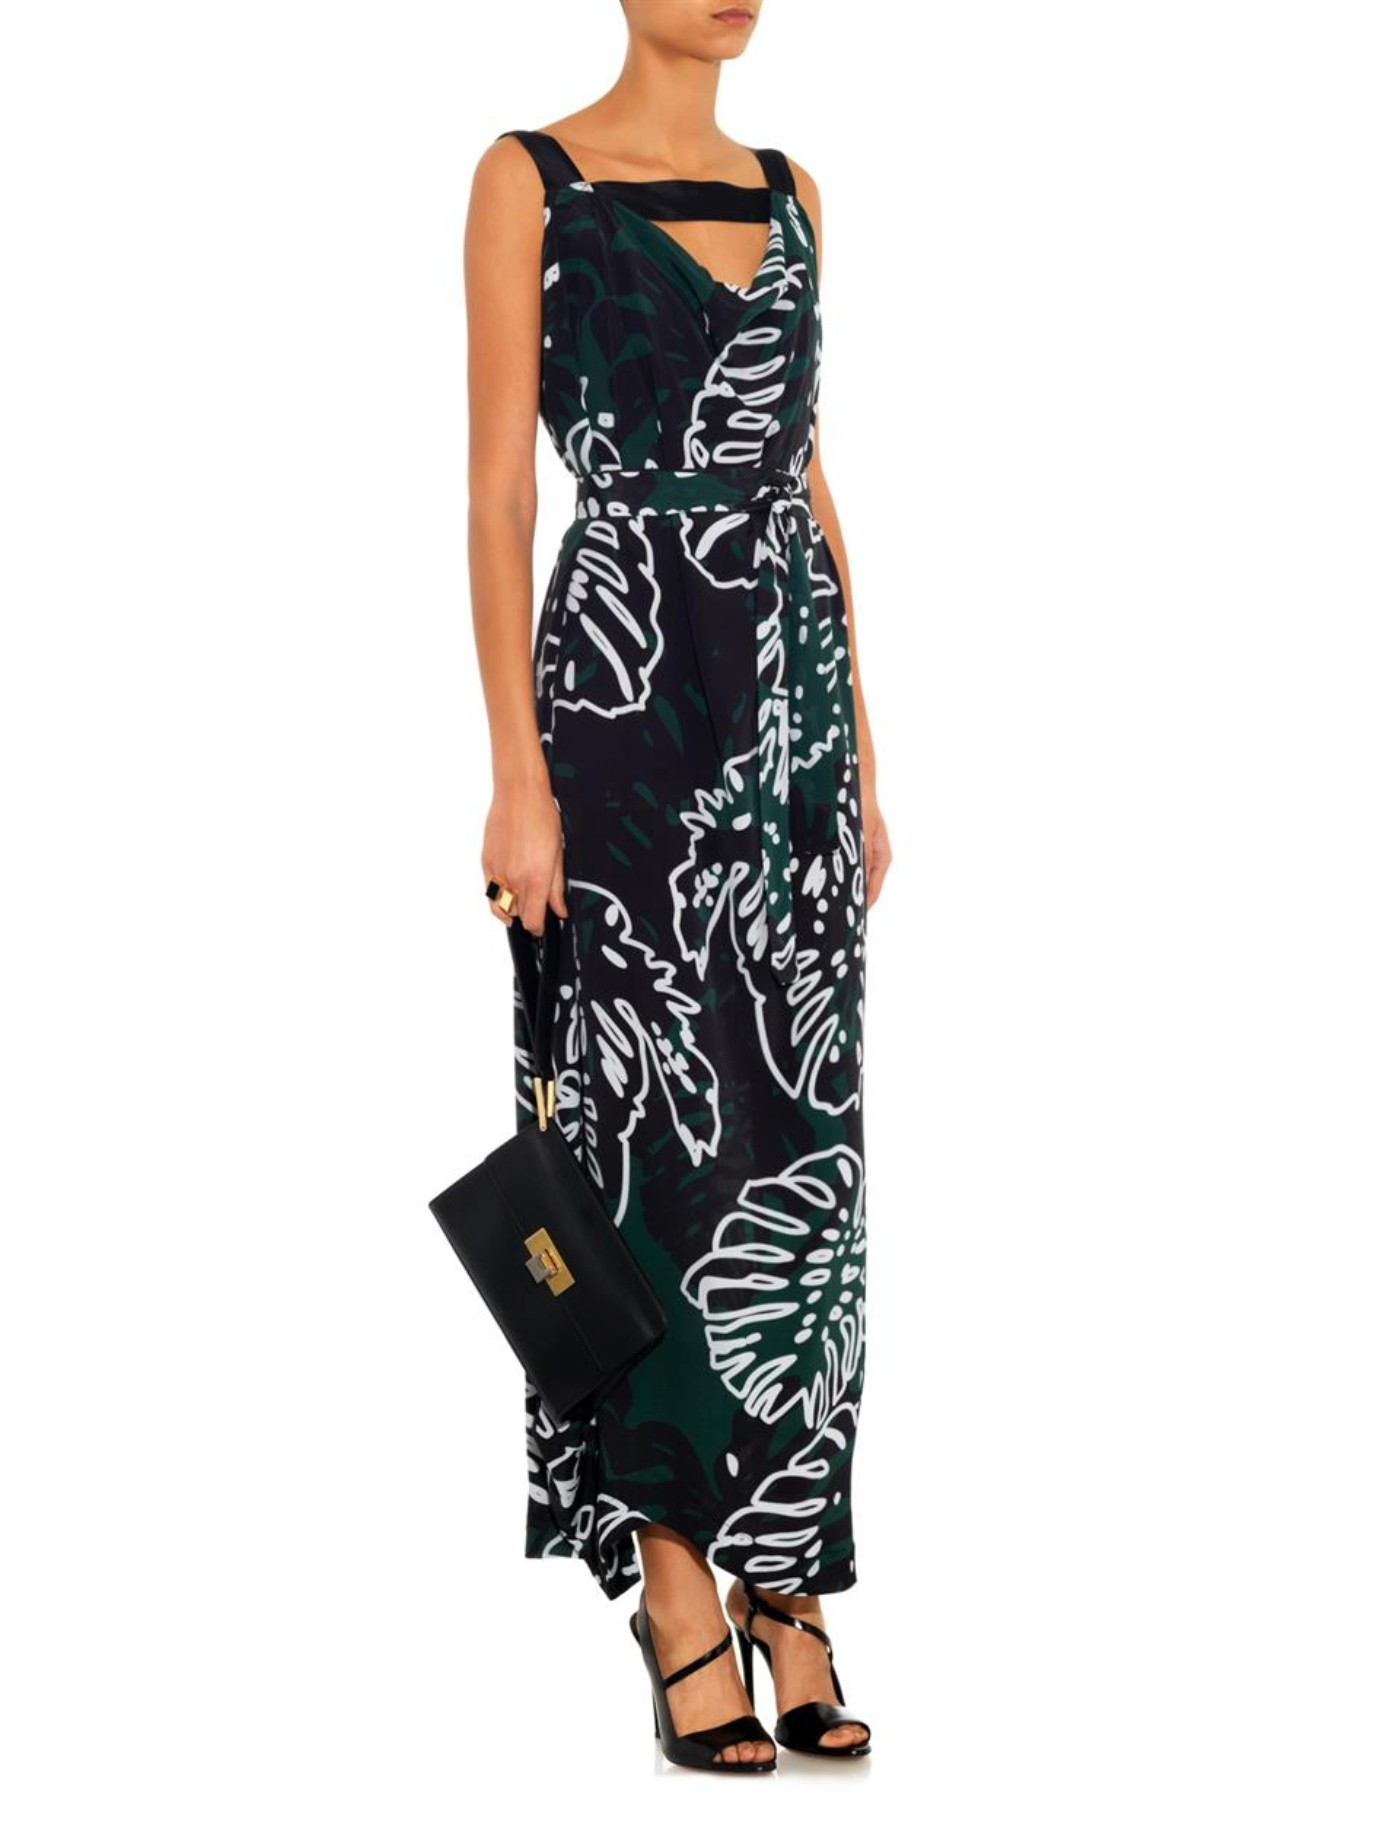 Lyst - Vivienne Westwood Anglomania Tigris Cheese Plant-Print Maxi ... 003d0c3e2